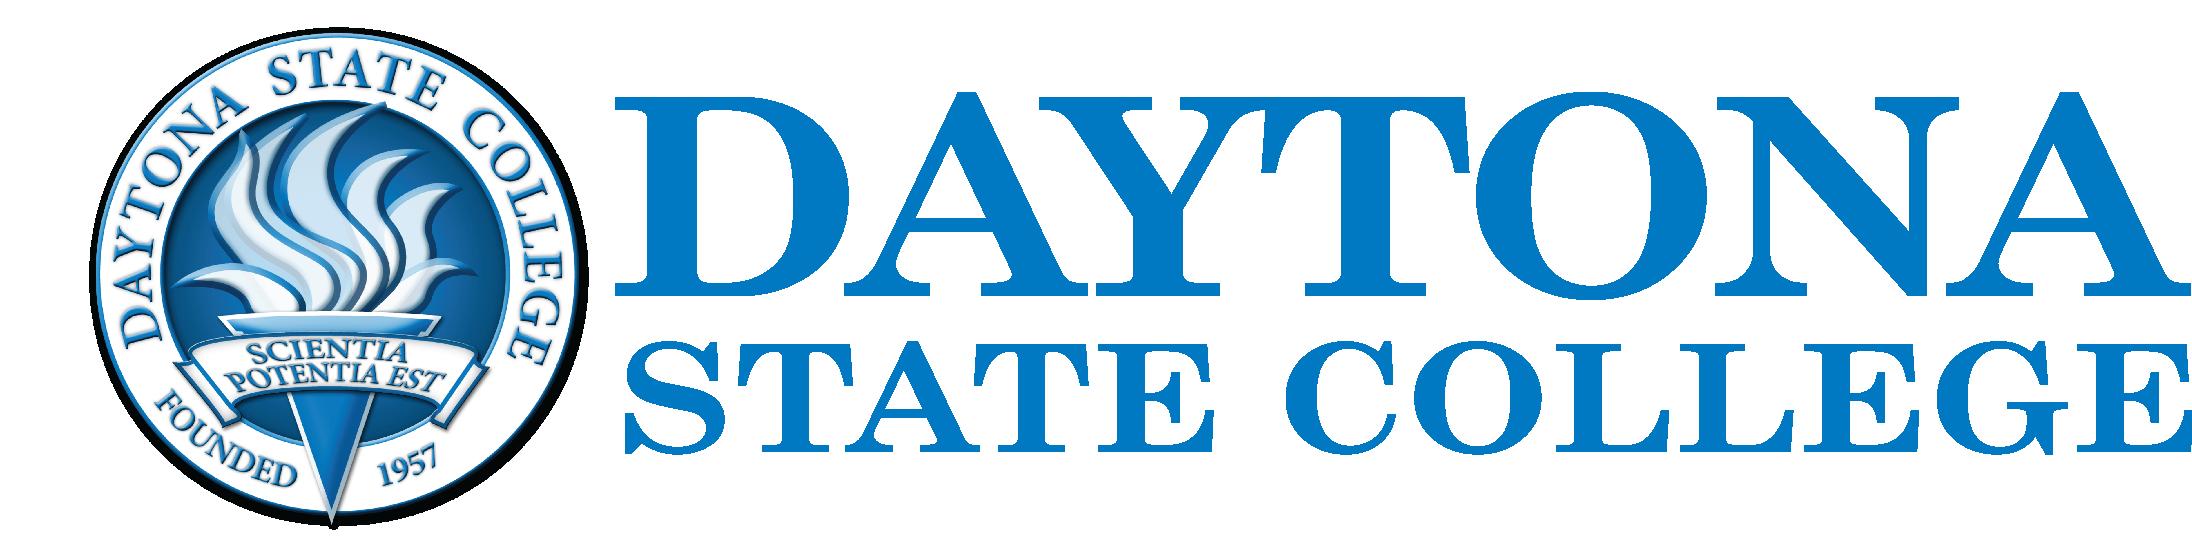 File:Daytona State College logo.png - Wikimedia Commons